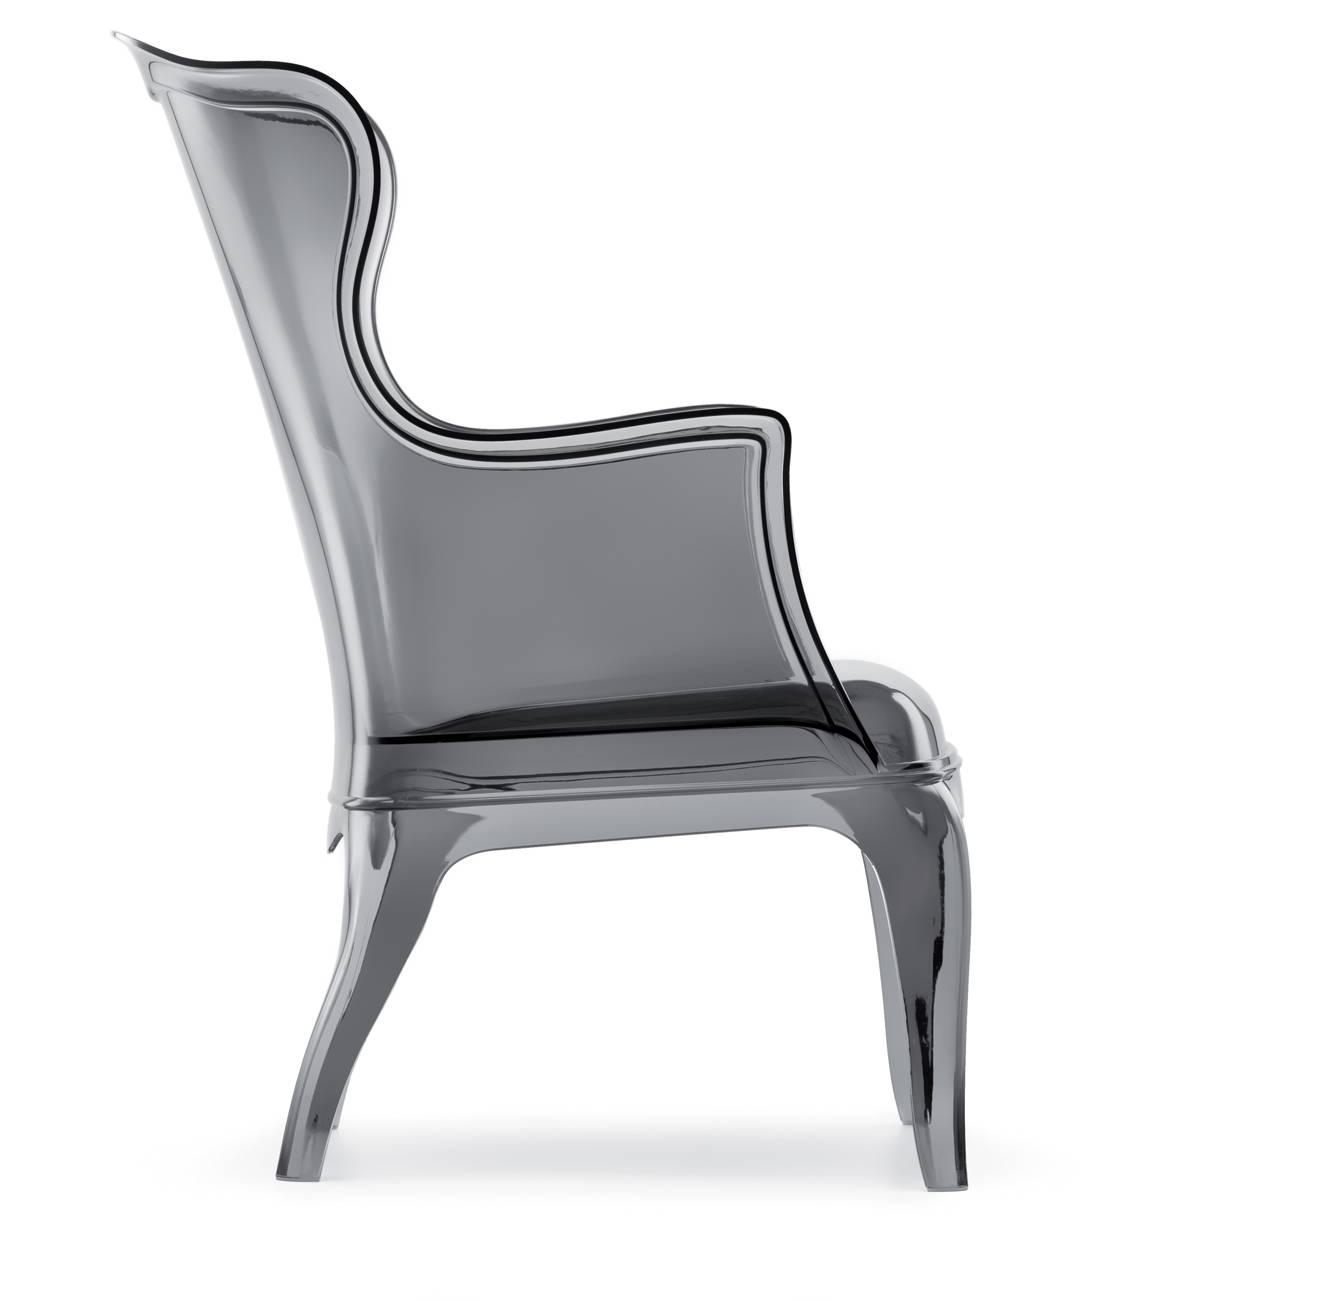 Fauteuil-design-Pasha-Pedrali-012